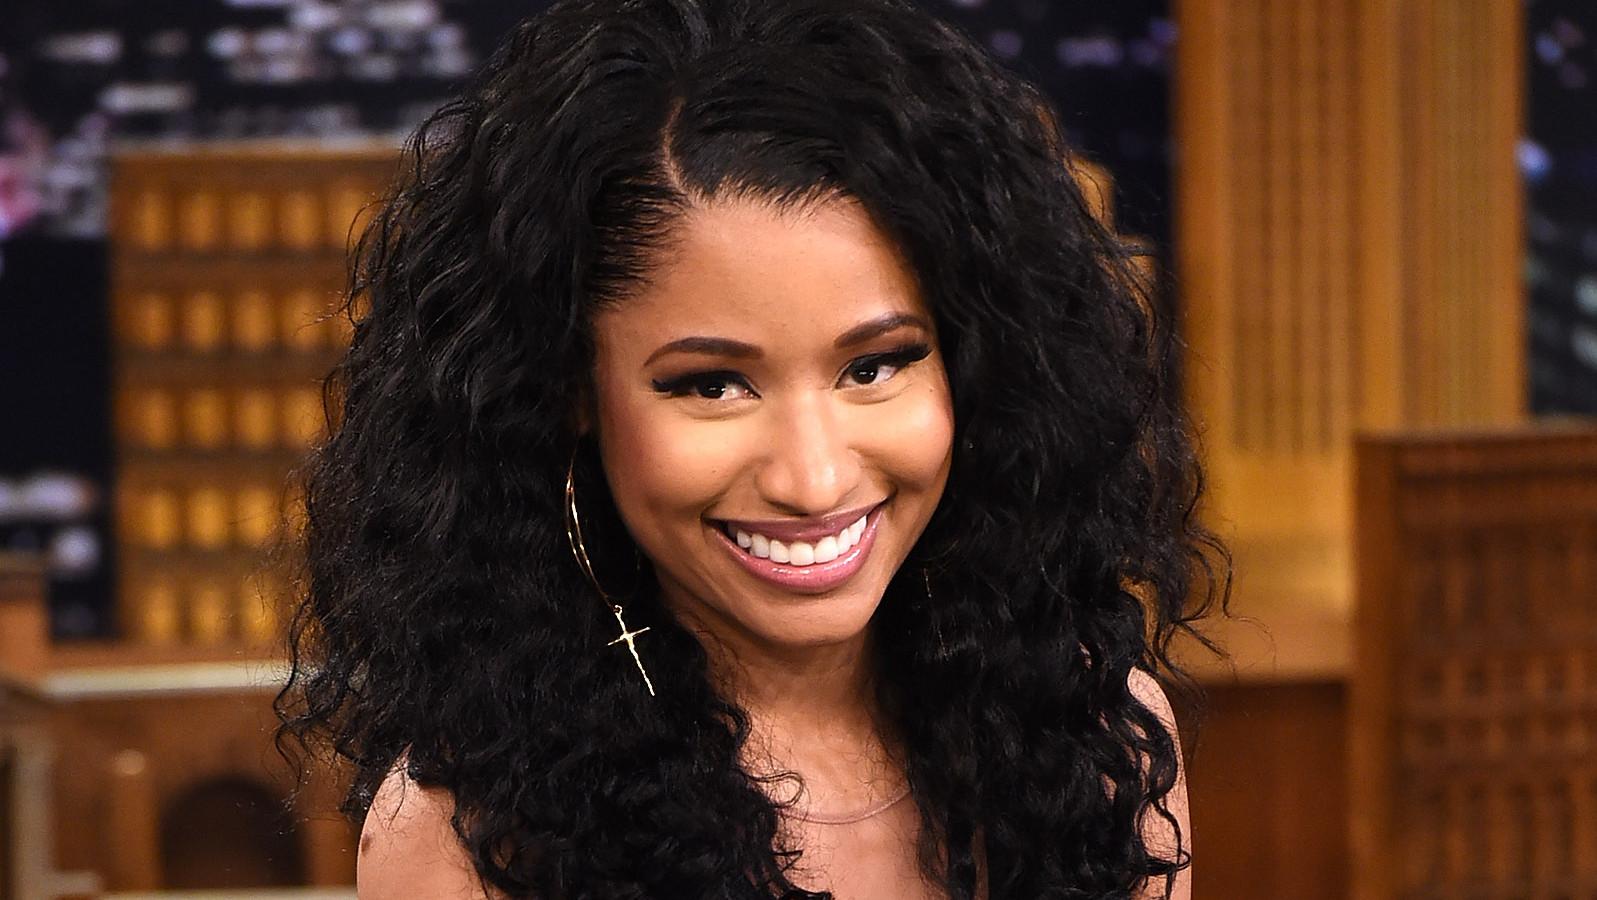 Nicki Minaj Smiling 2015 Www Pixshark Com Images